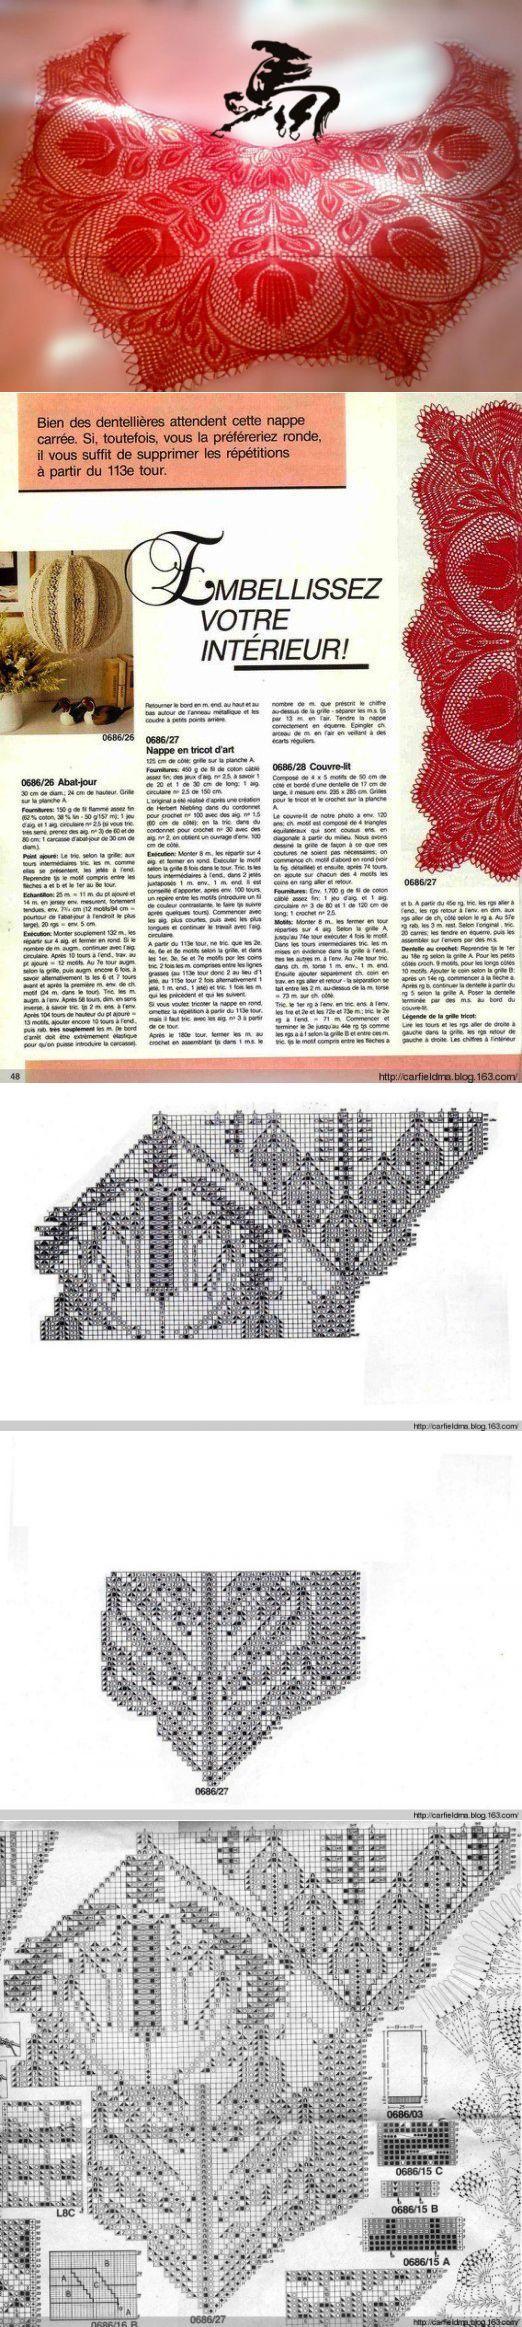 схема для вязания шаль харуни